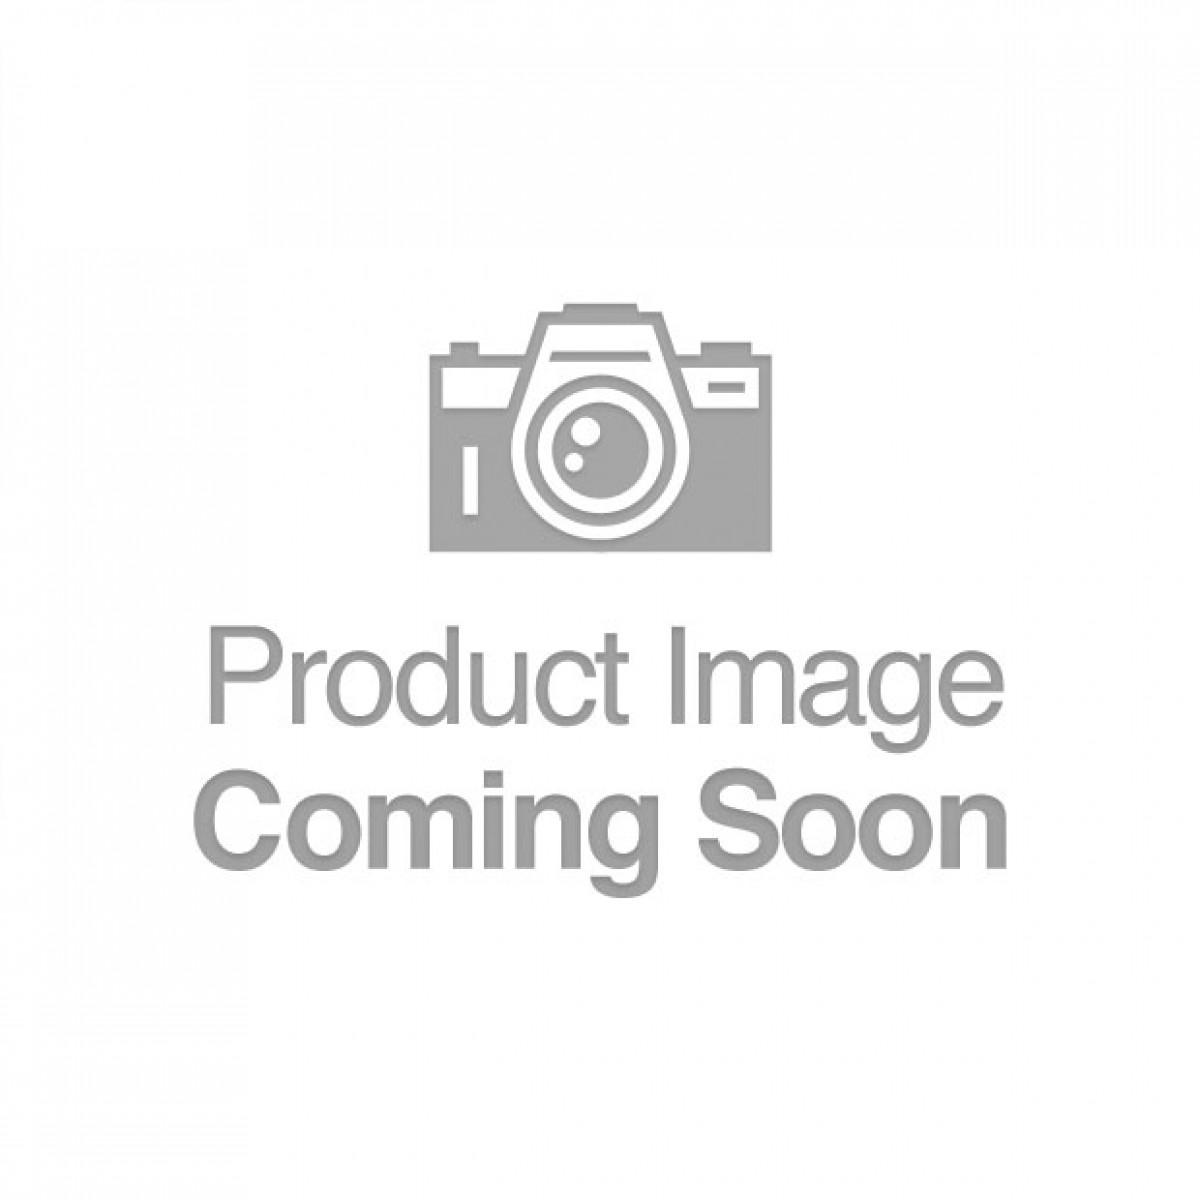 Blush Avant D16 Silicone Dildo - Purple Haze